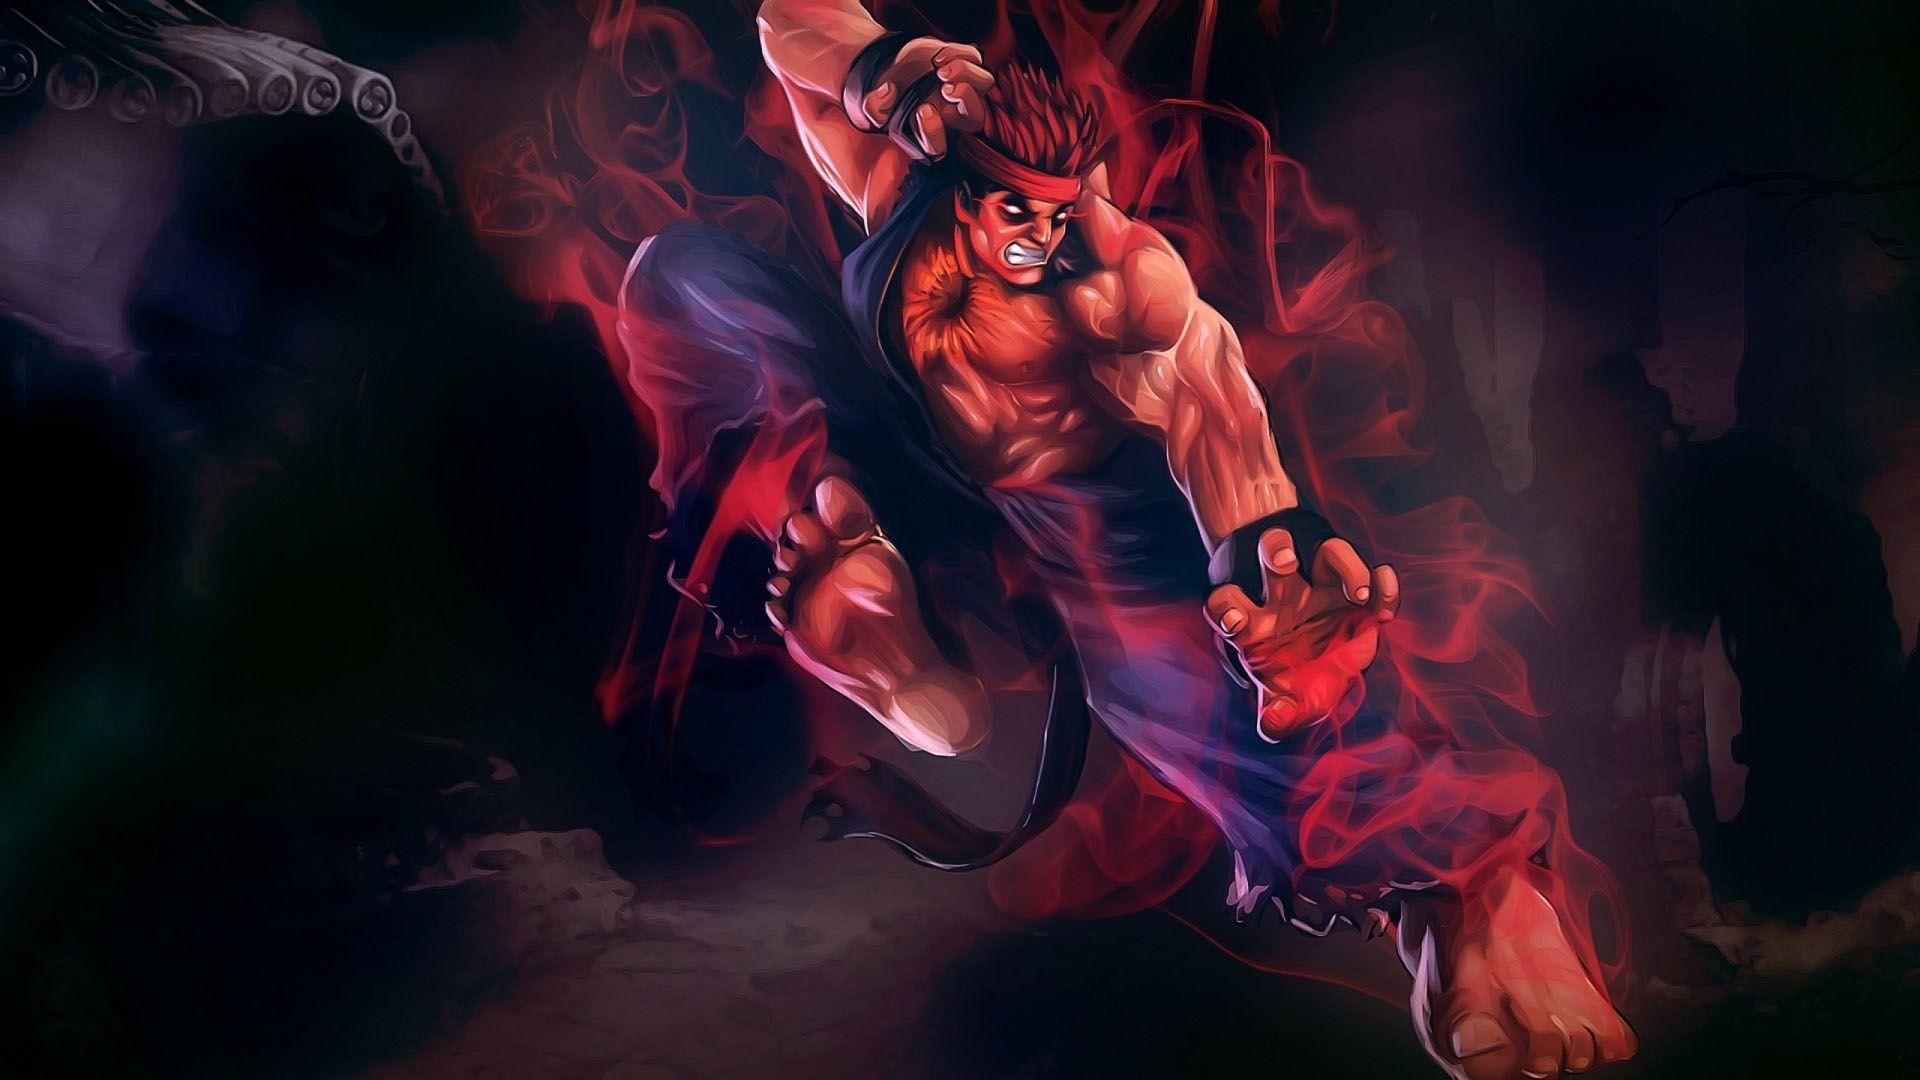 Res: 1920x1080, Evil Ryu Wallpaper   Wallpapers HD   Pinterest